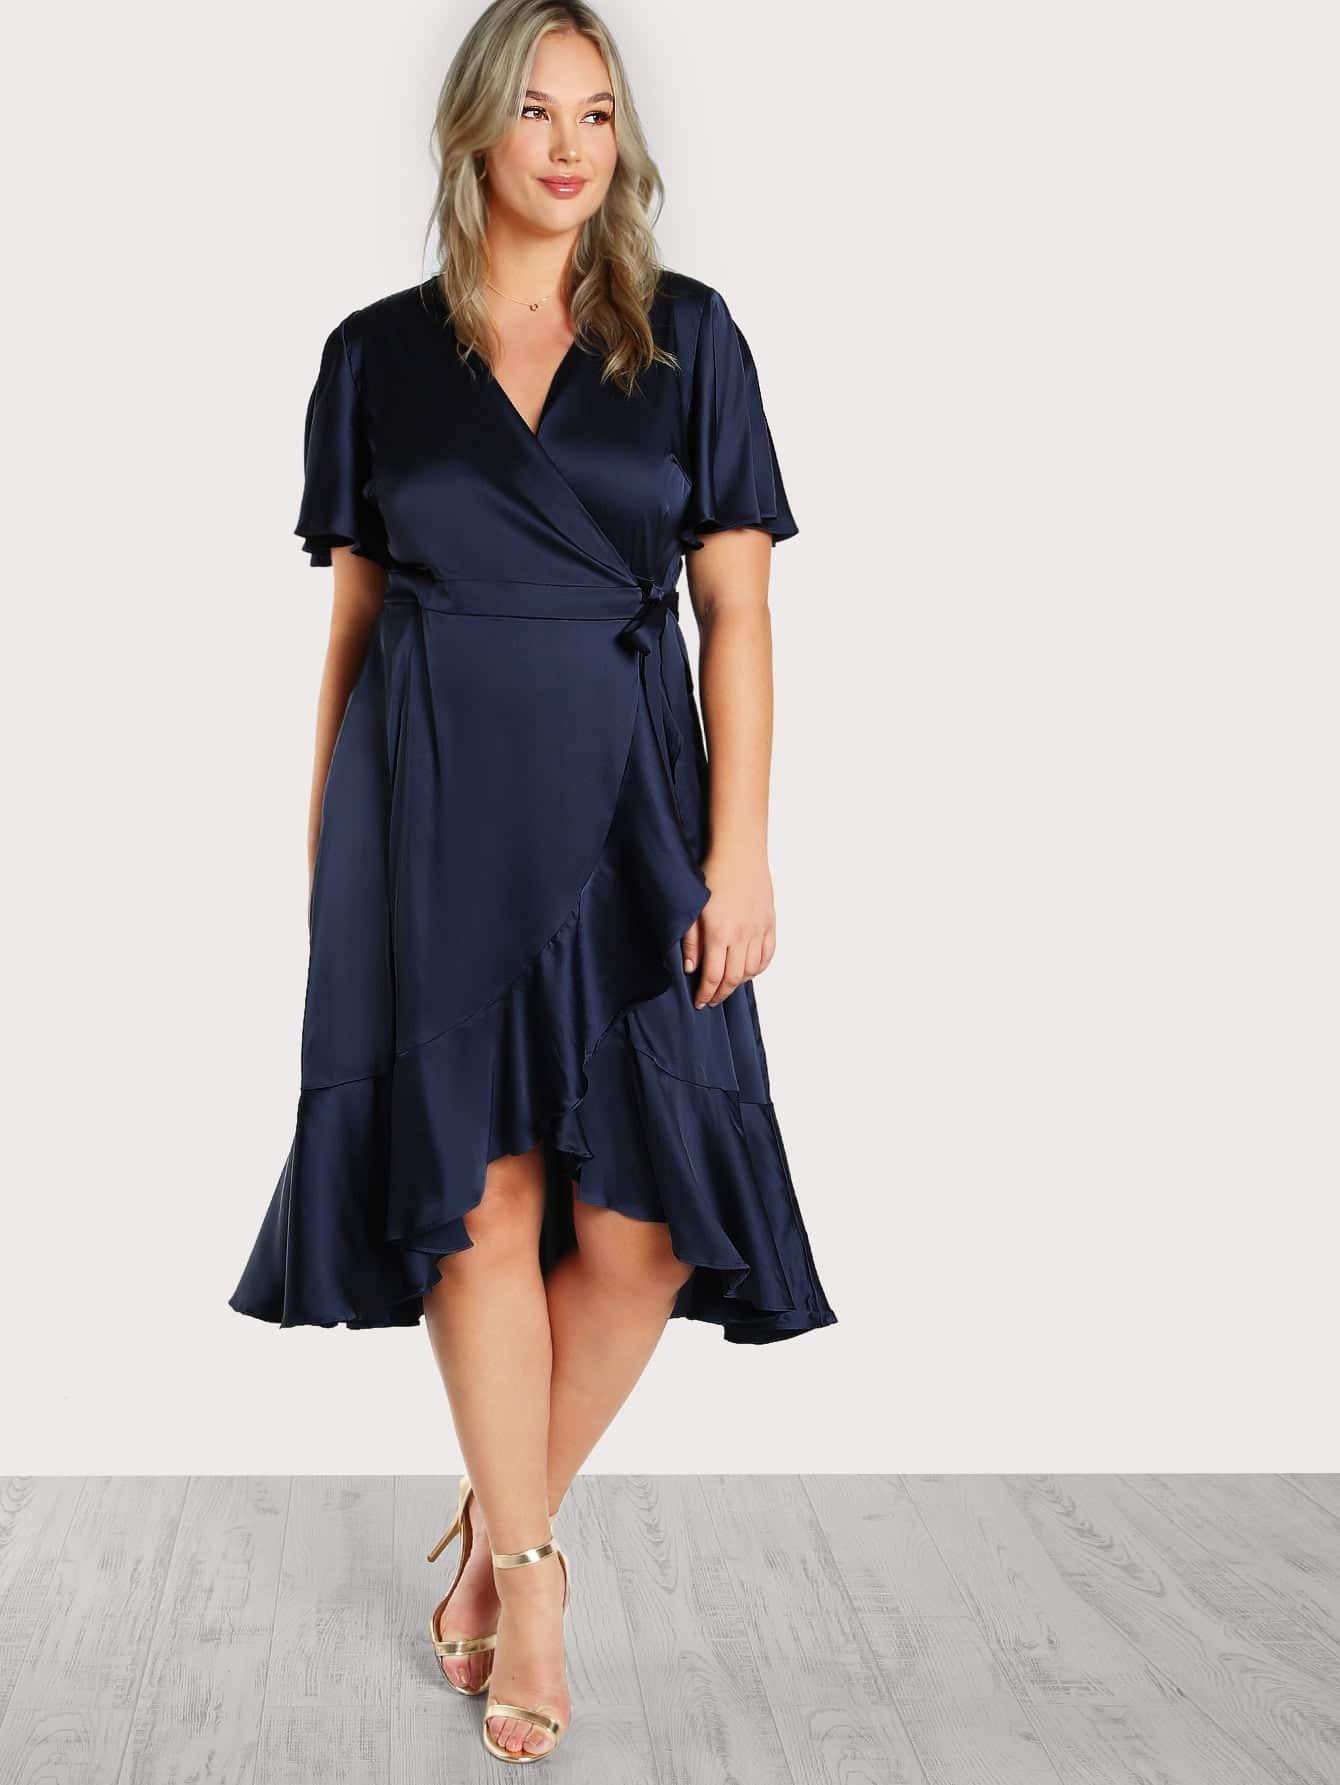 robe satin avec lacet french romwe. Black Bedroom Furniture Sets. Home Design Ideas